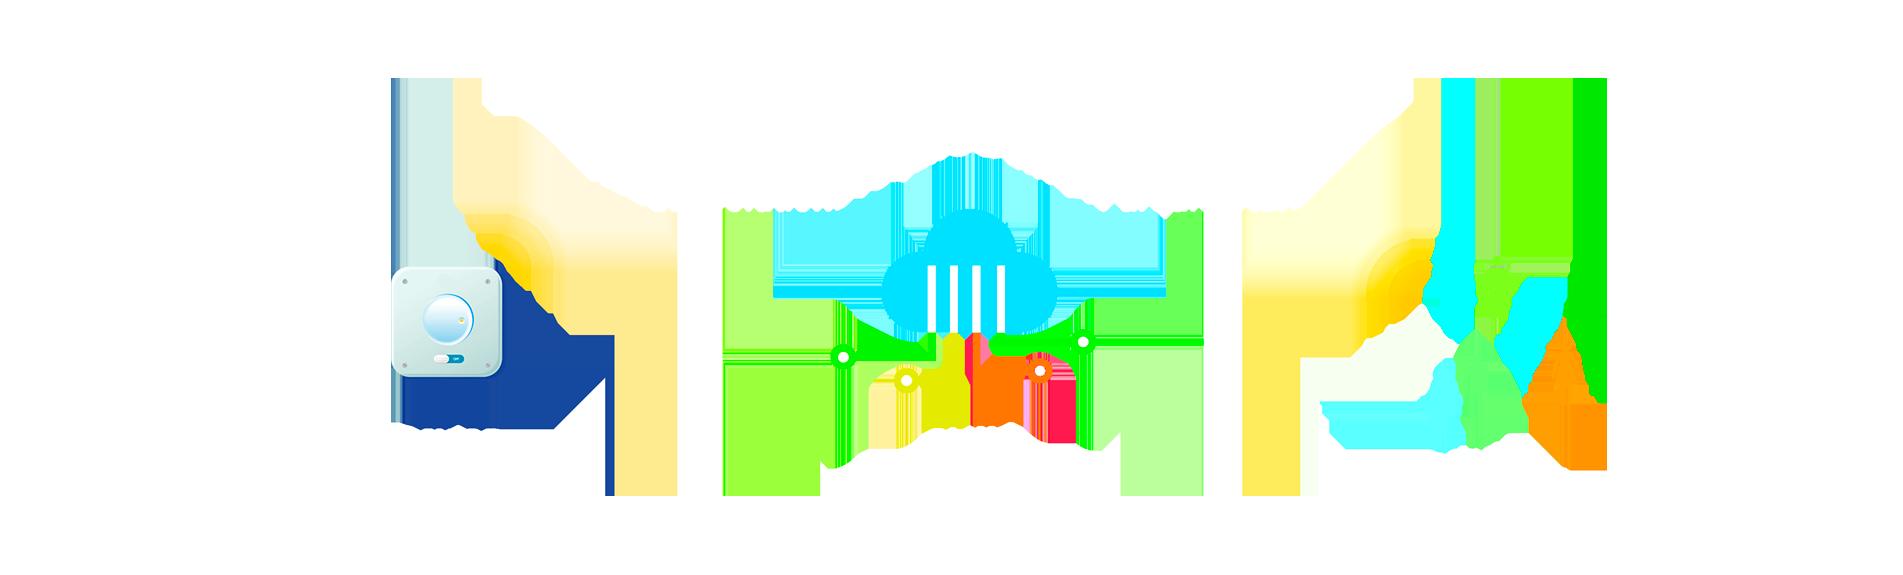 IoT y m2m solutions Kinimara. SIGFOX y Cloud